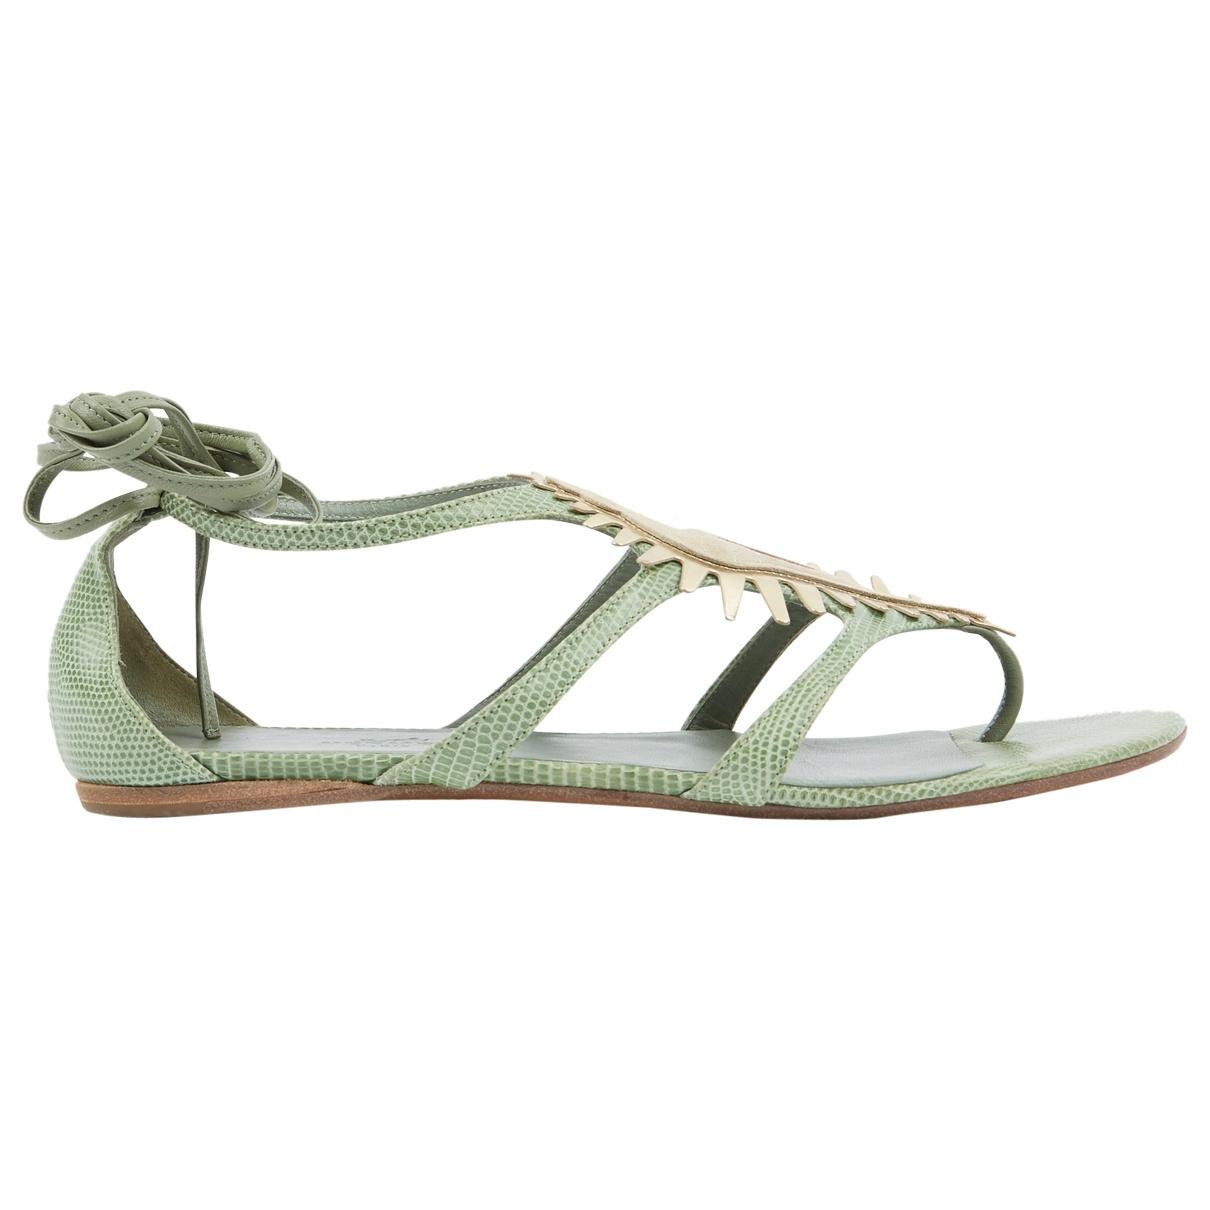 Hermès \N Green Leather Sandals for Women 38 EU